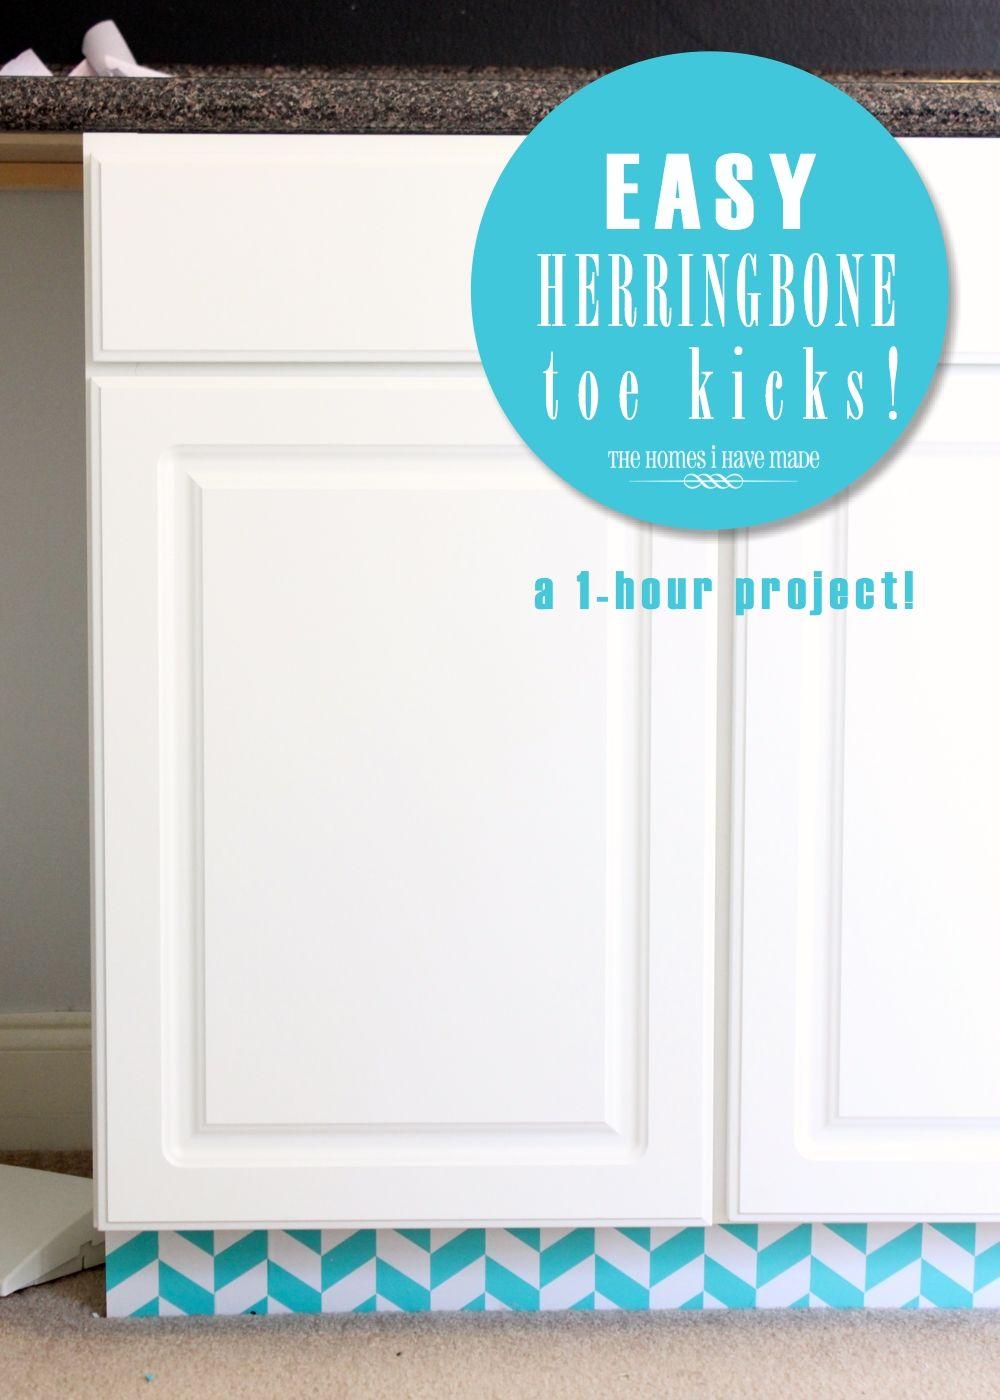 Easy Herringbone Toe Kicks Home Improvement Home Diy Home Decor